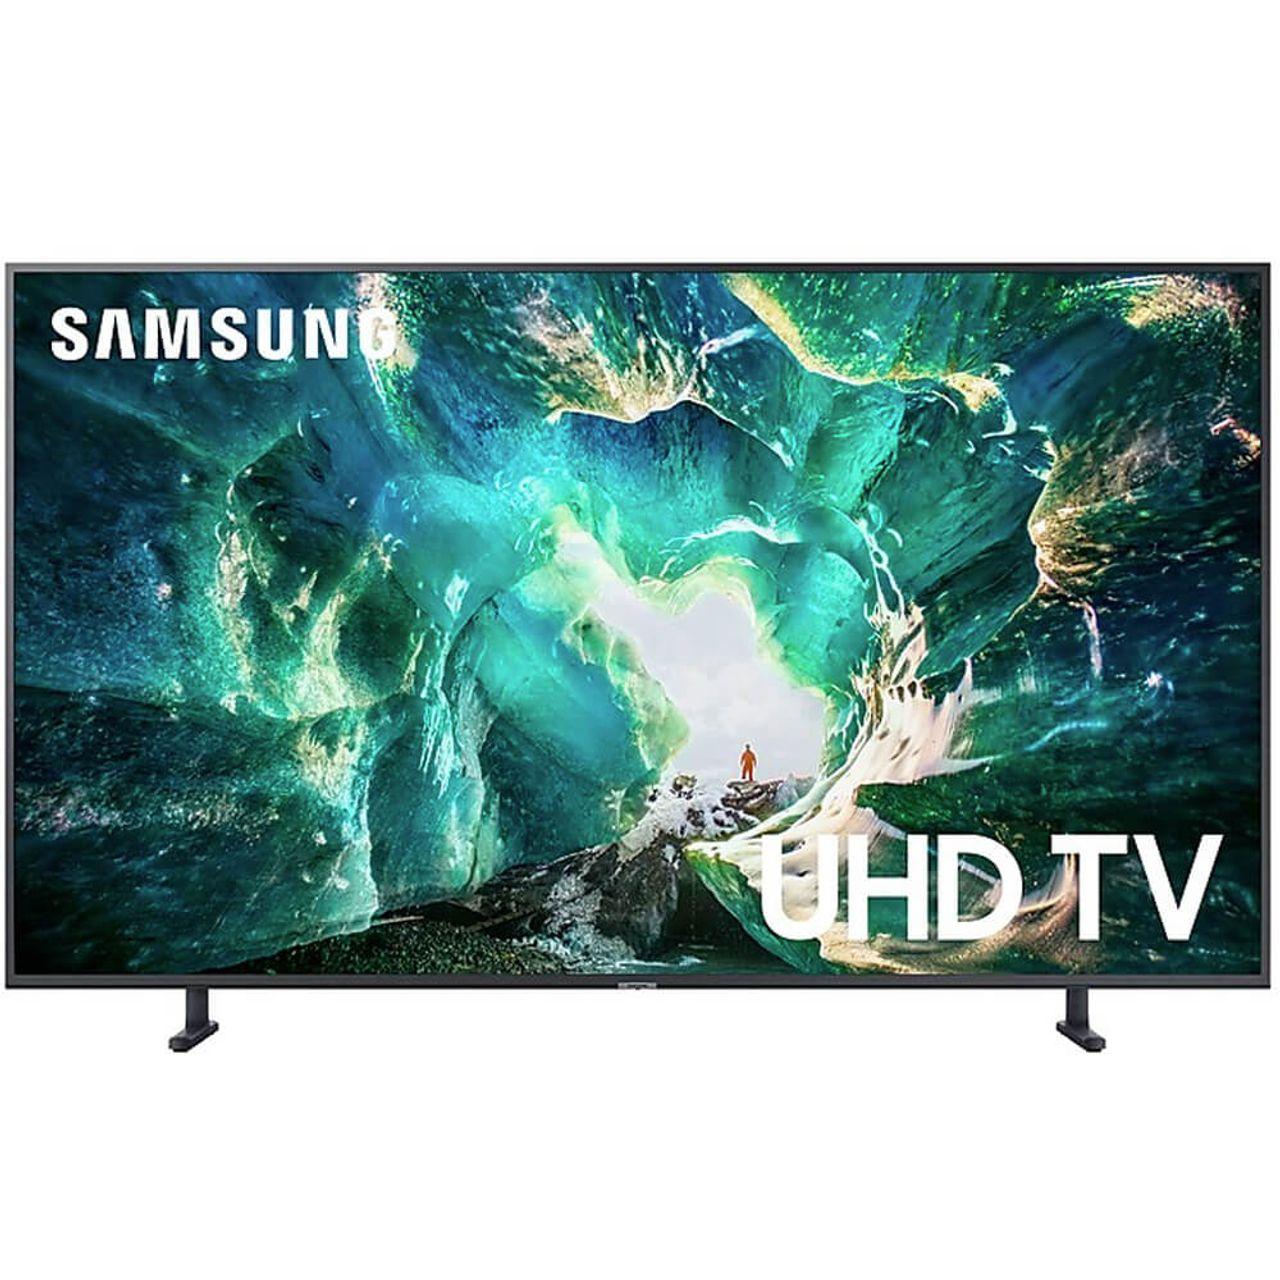 "Samsung 82"" Class 8 Series 4K UHD LED Smart TV (2019 Model) UN82RU8000FXZA for $1579 + Free Shipping"